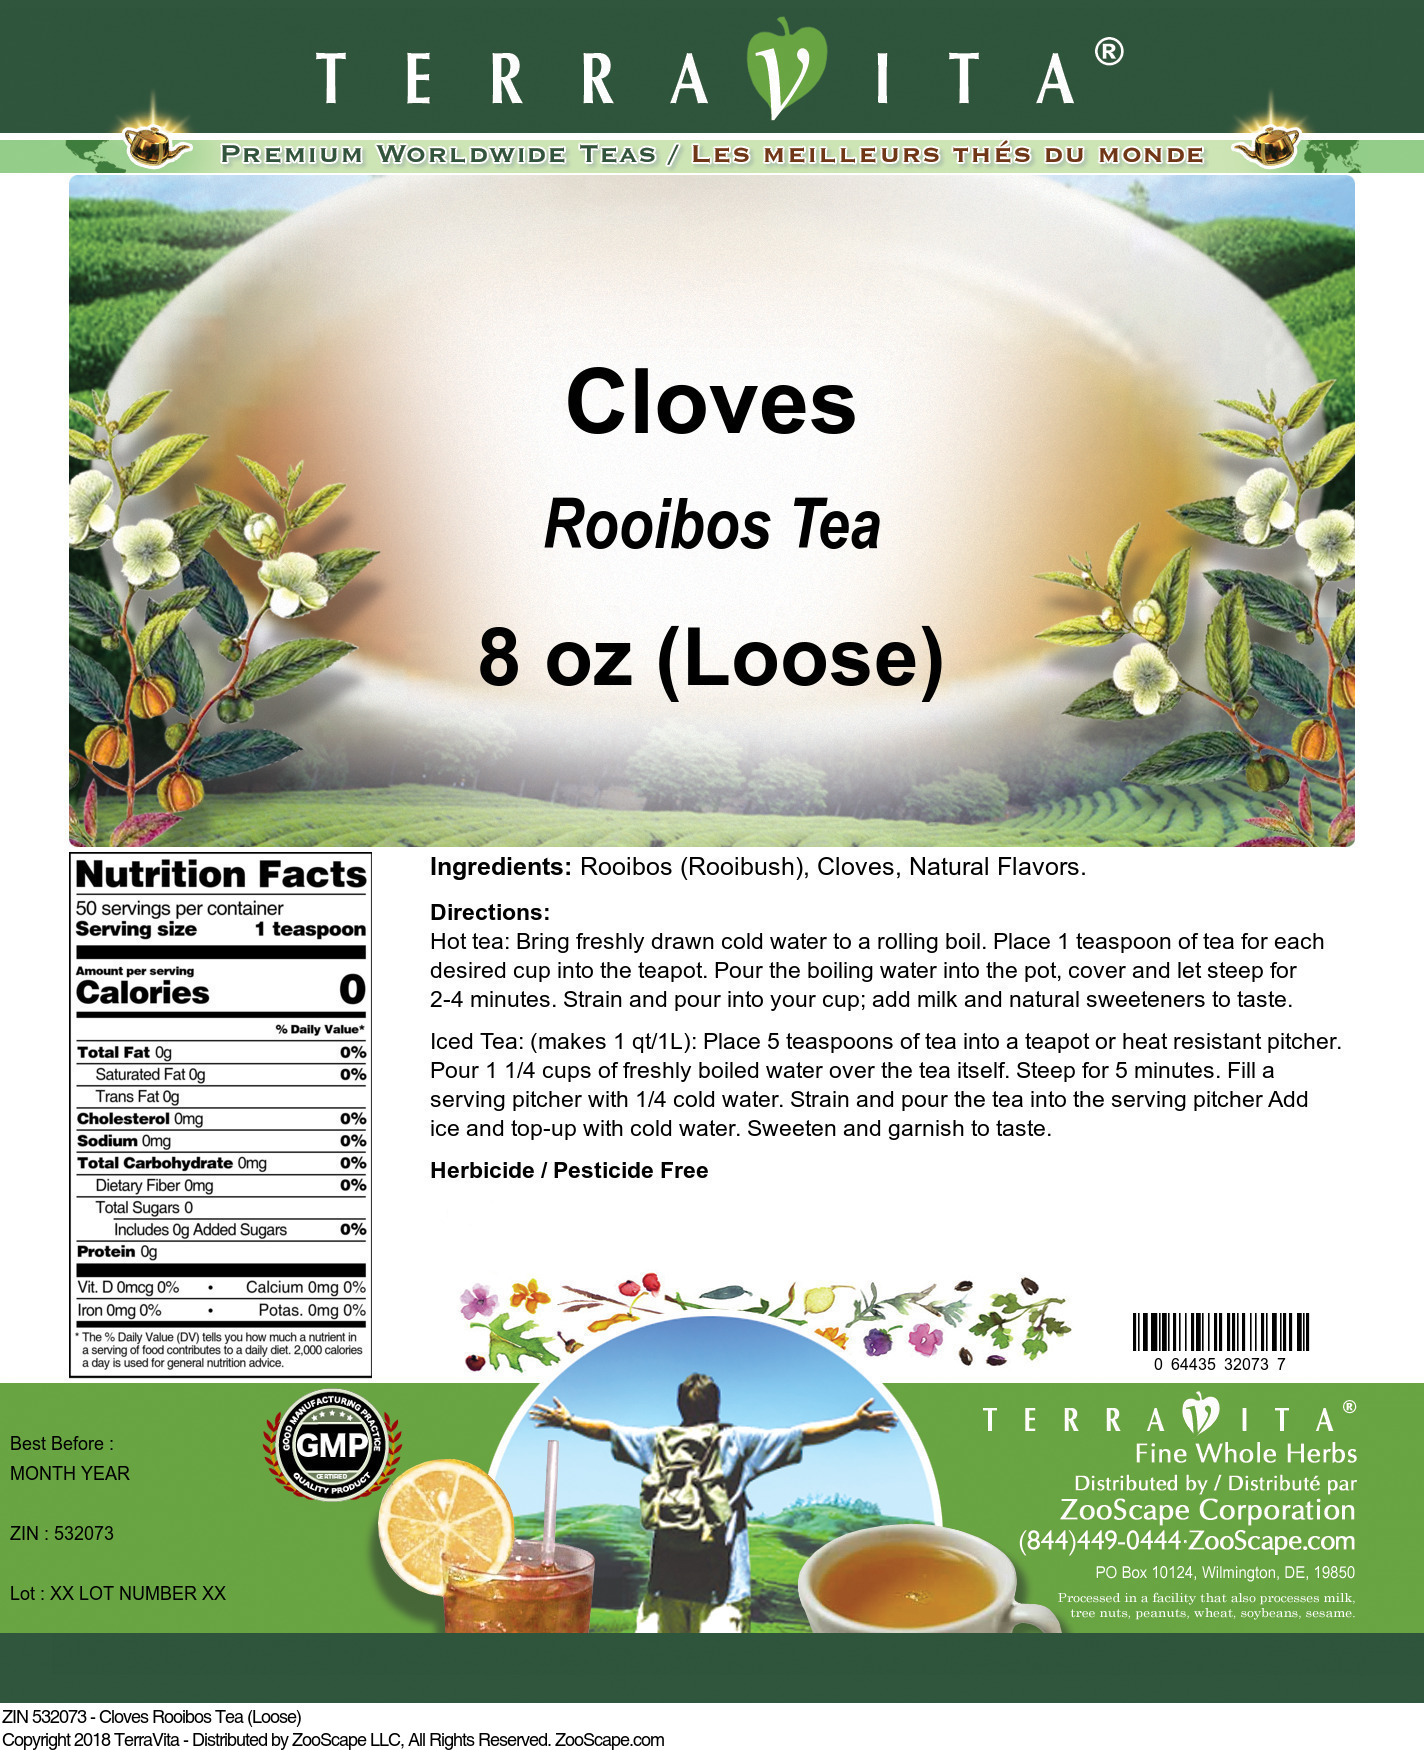 Cloves Rooibos Tea